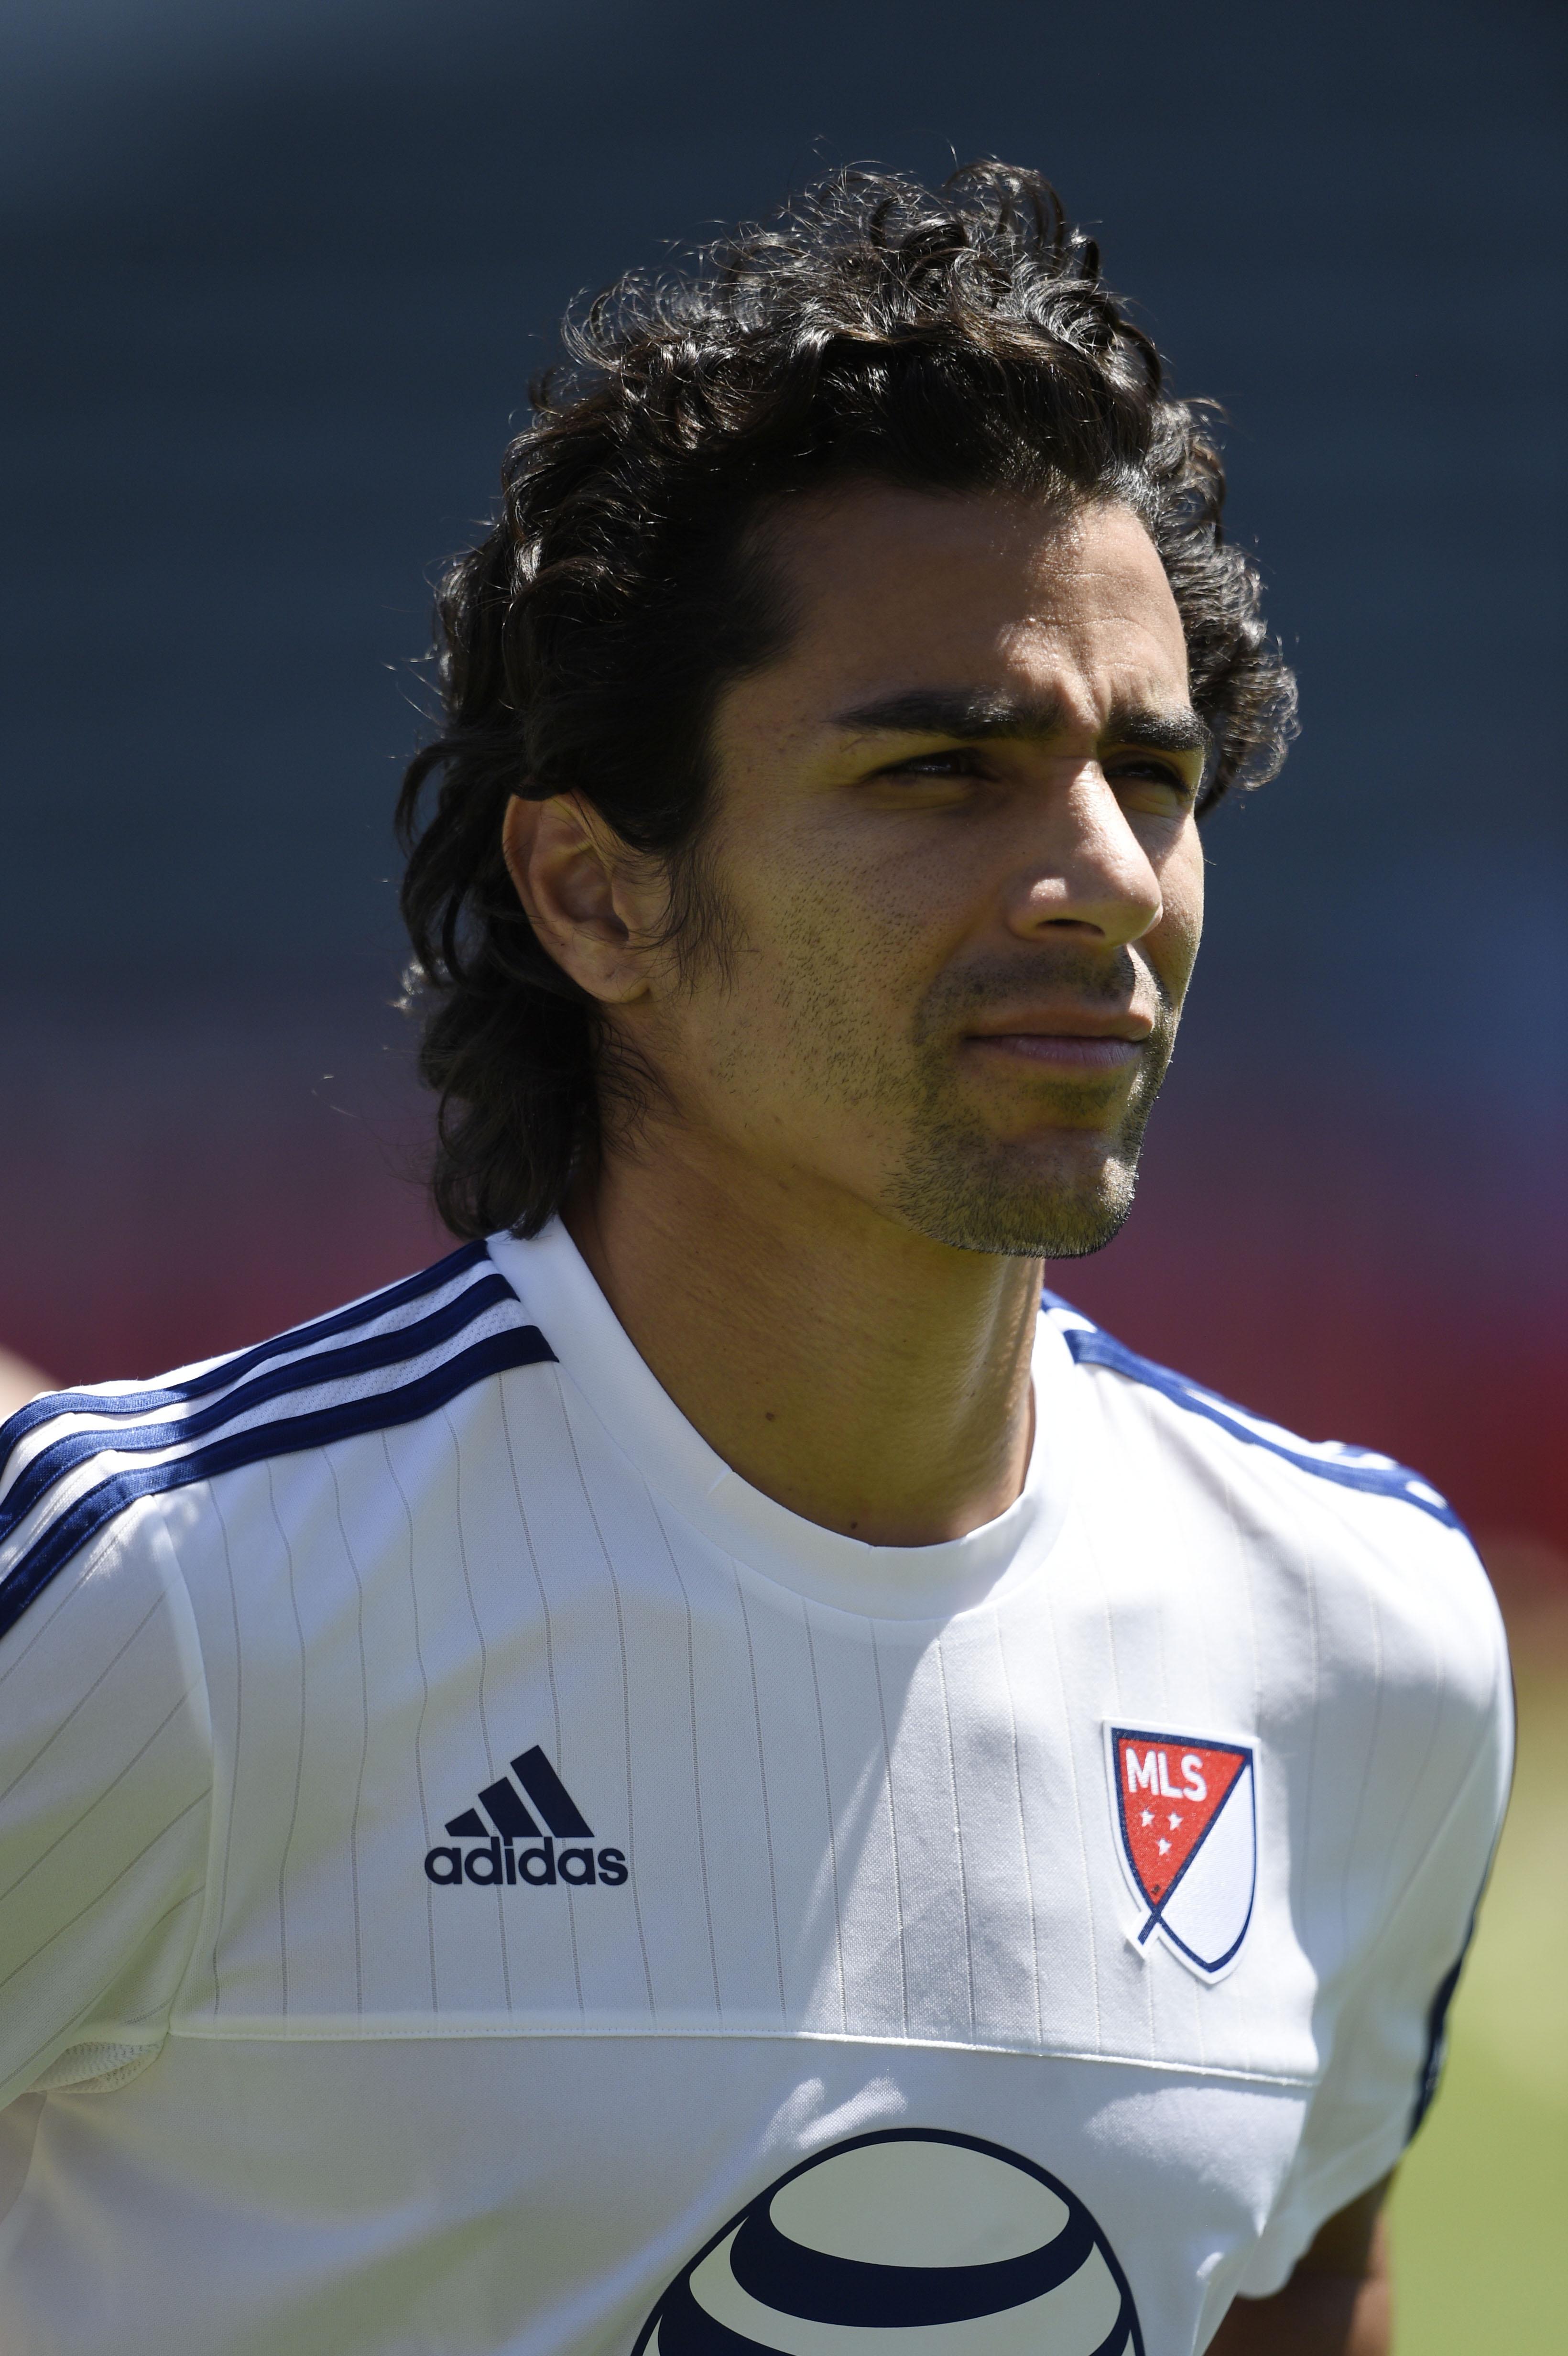 MLS: All-Star and Tottenham Training